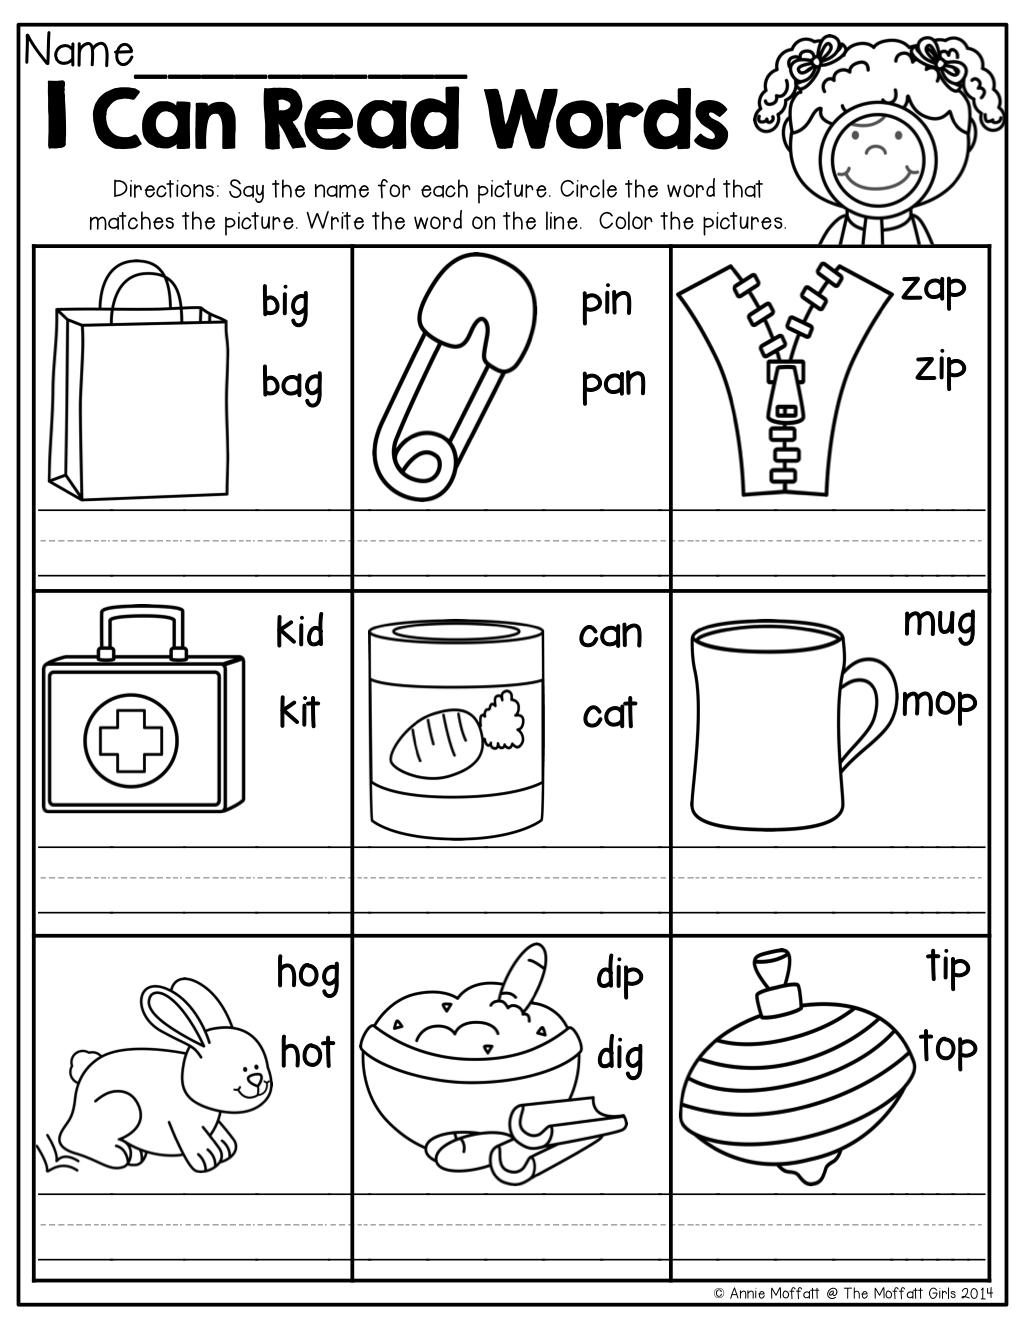 Cvc Worksheets For Kindergarten For Free Download - Math Worksheet | Cvc Worksheet Printable